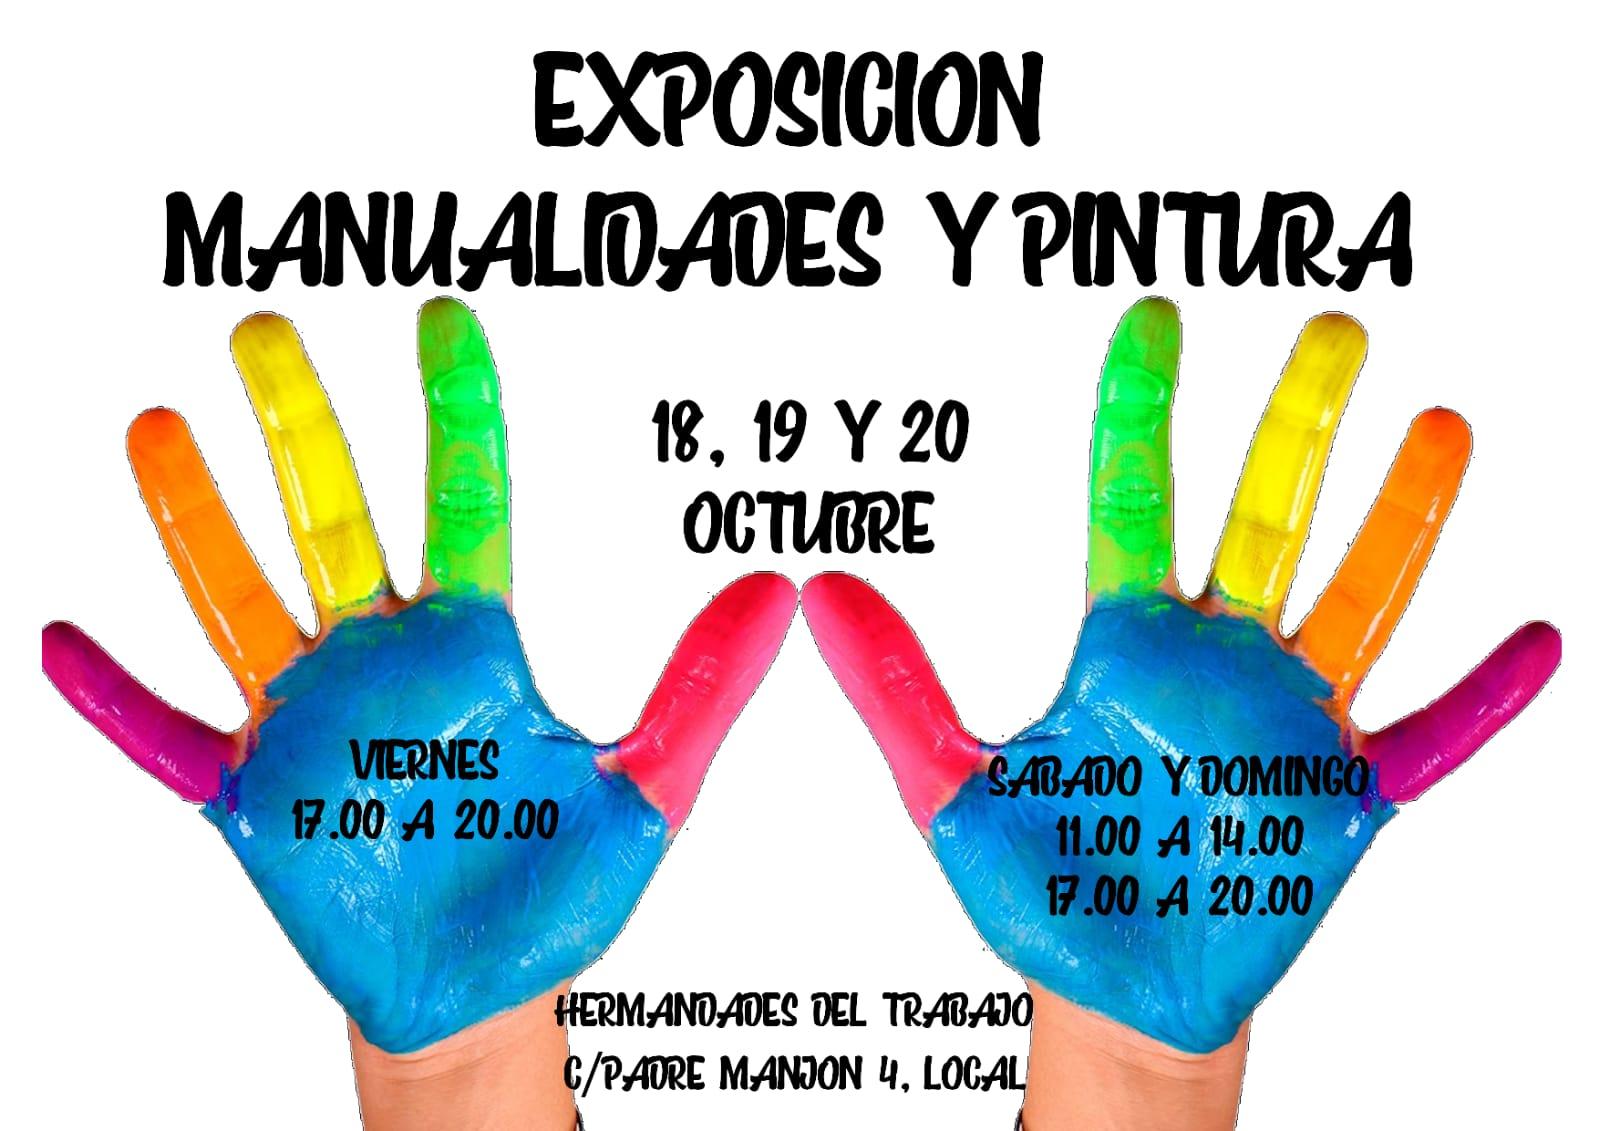 EXPOSICIÓN DE PINTURA Y MANUALIDADES. NO OS LA PERDÁIS.